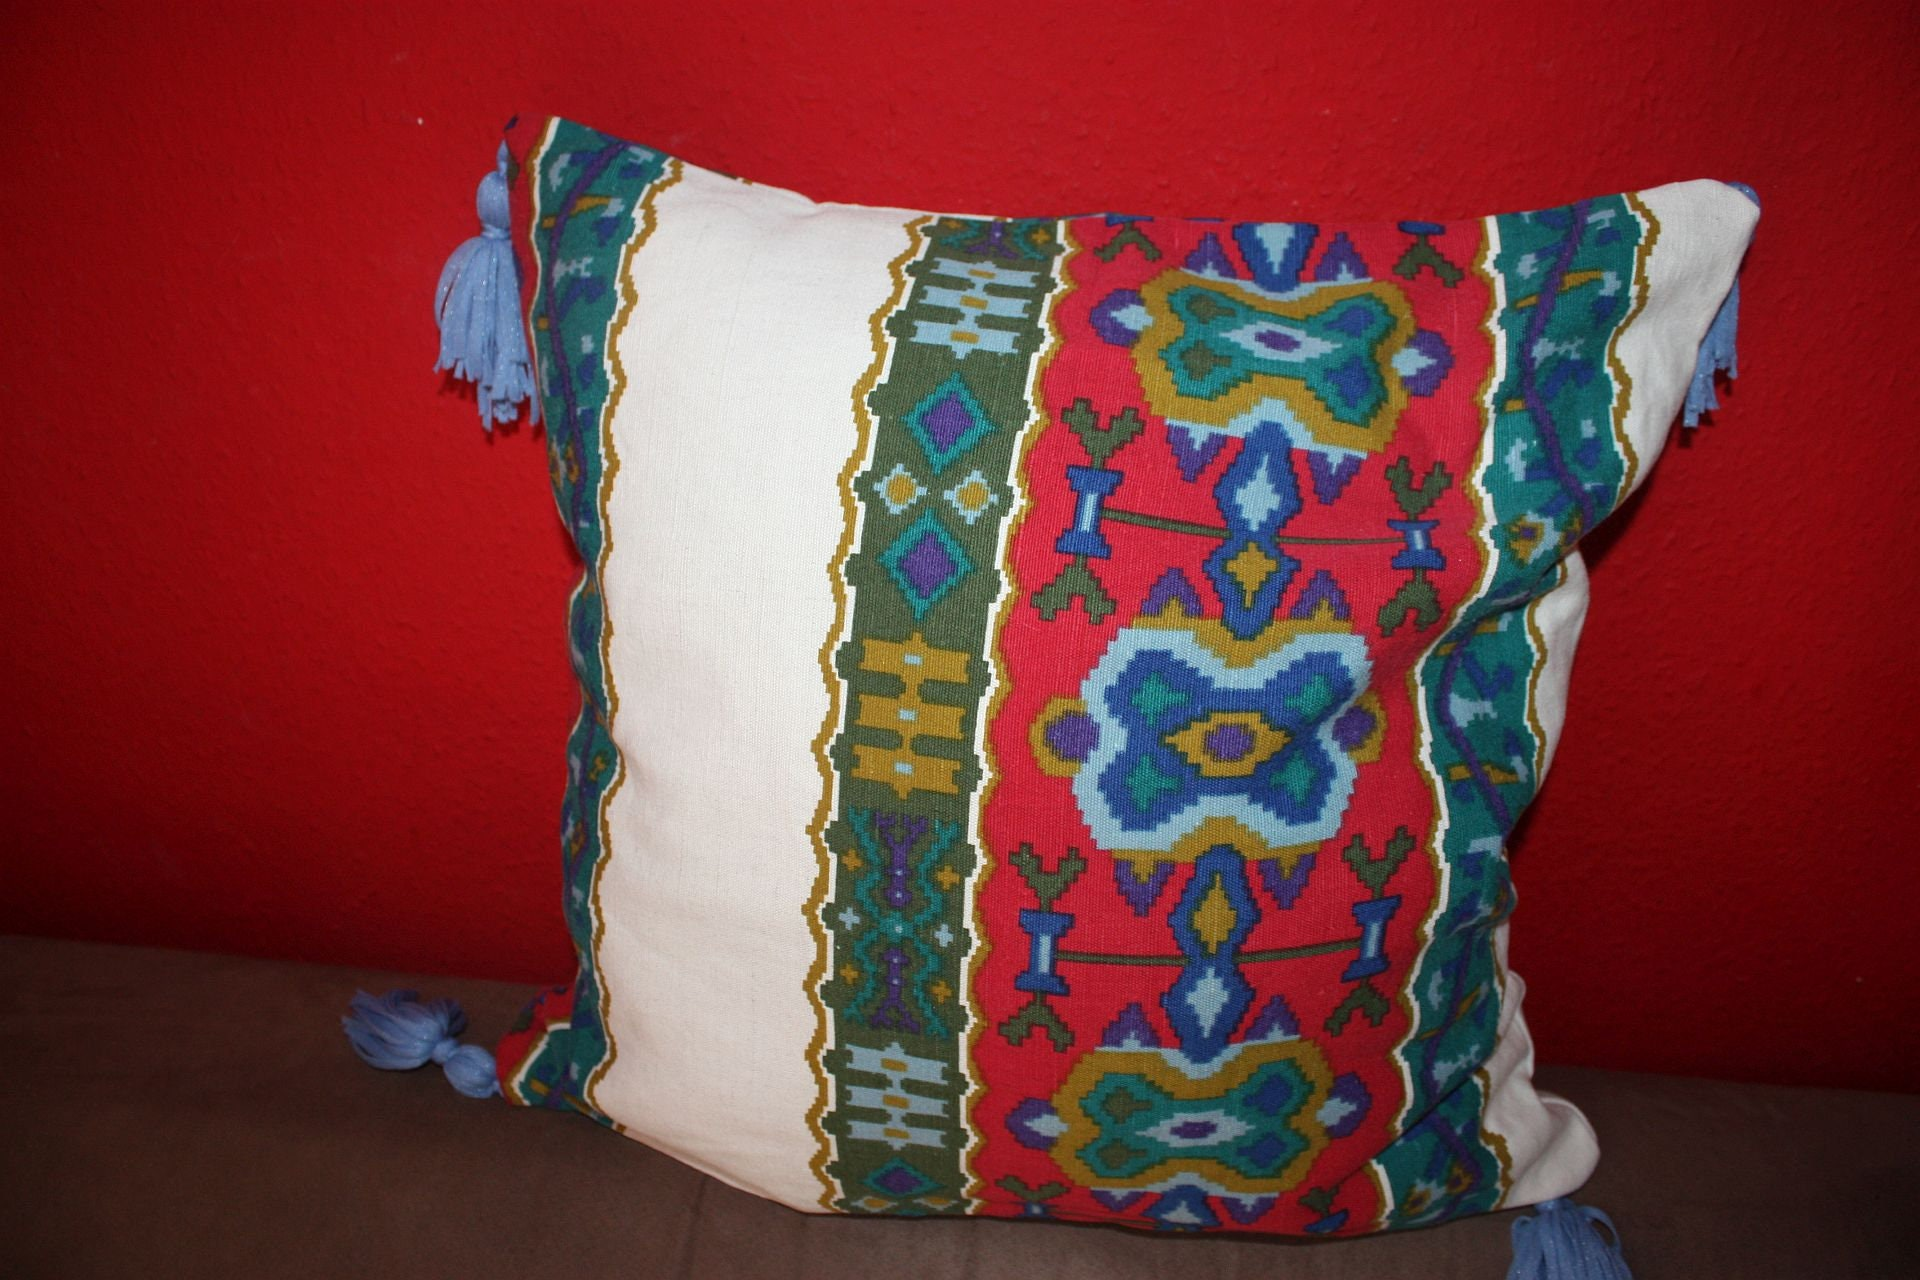 Frida Kahlo for women gift pillow Pillow Cushion Red Ethno  db39f0d747